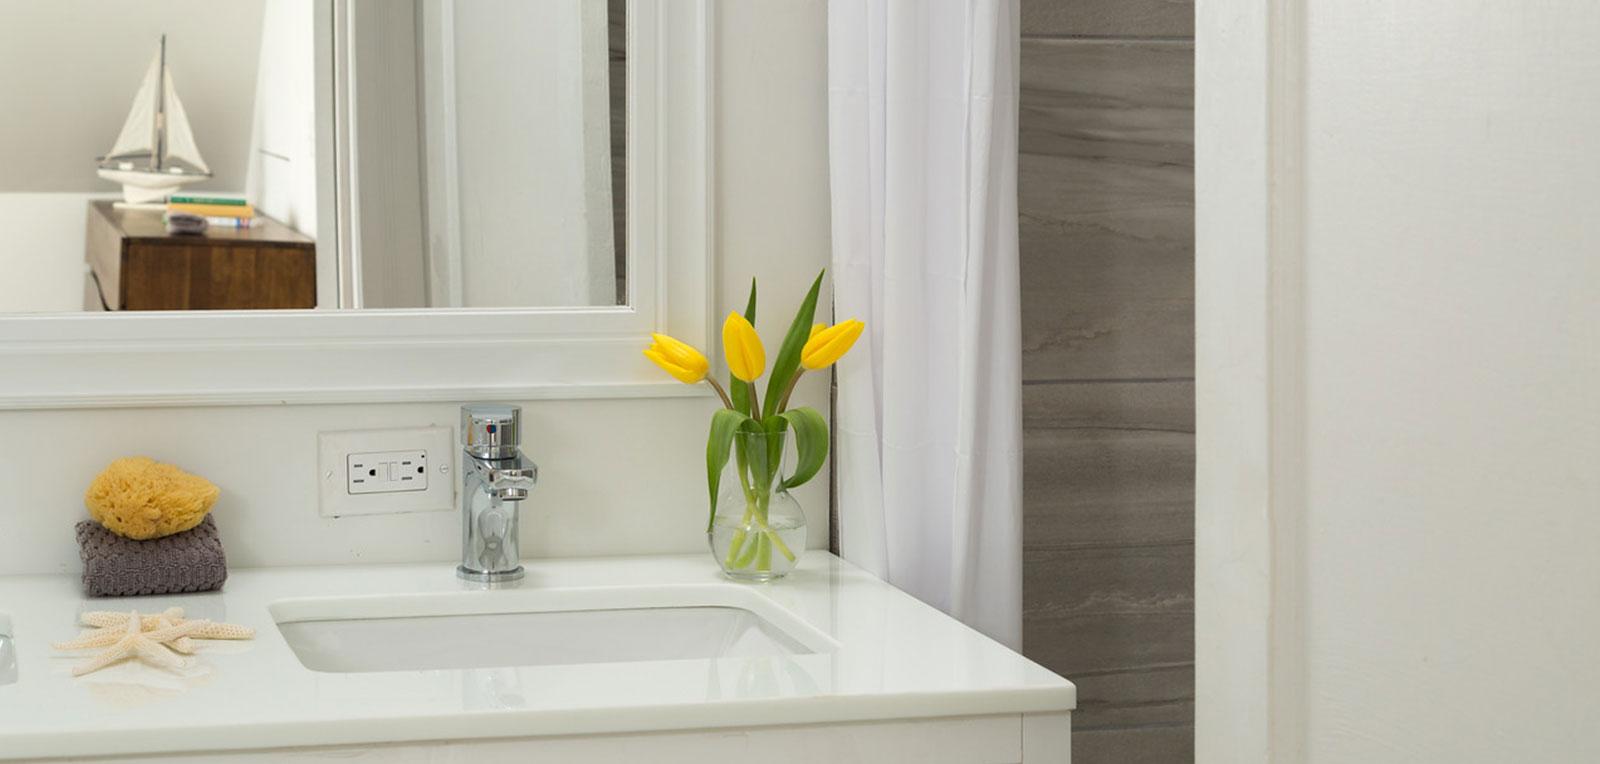 2BR Apartment Bathroom Faucet and Flower | ADMIRAL SIMS B&B, Newport Rhode Island